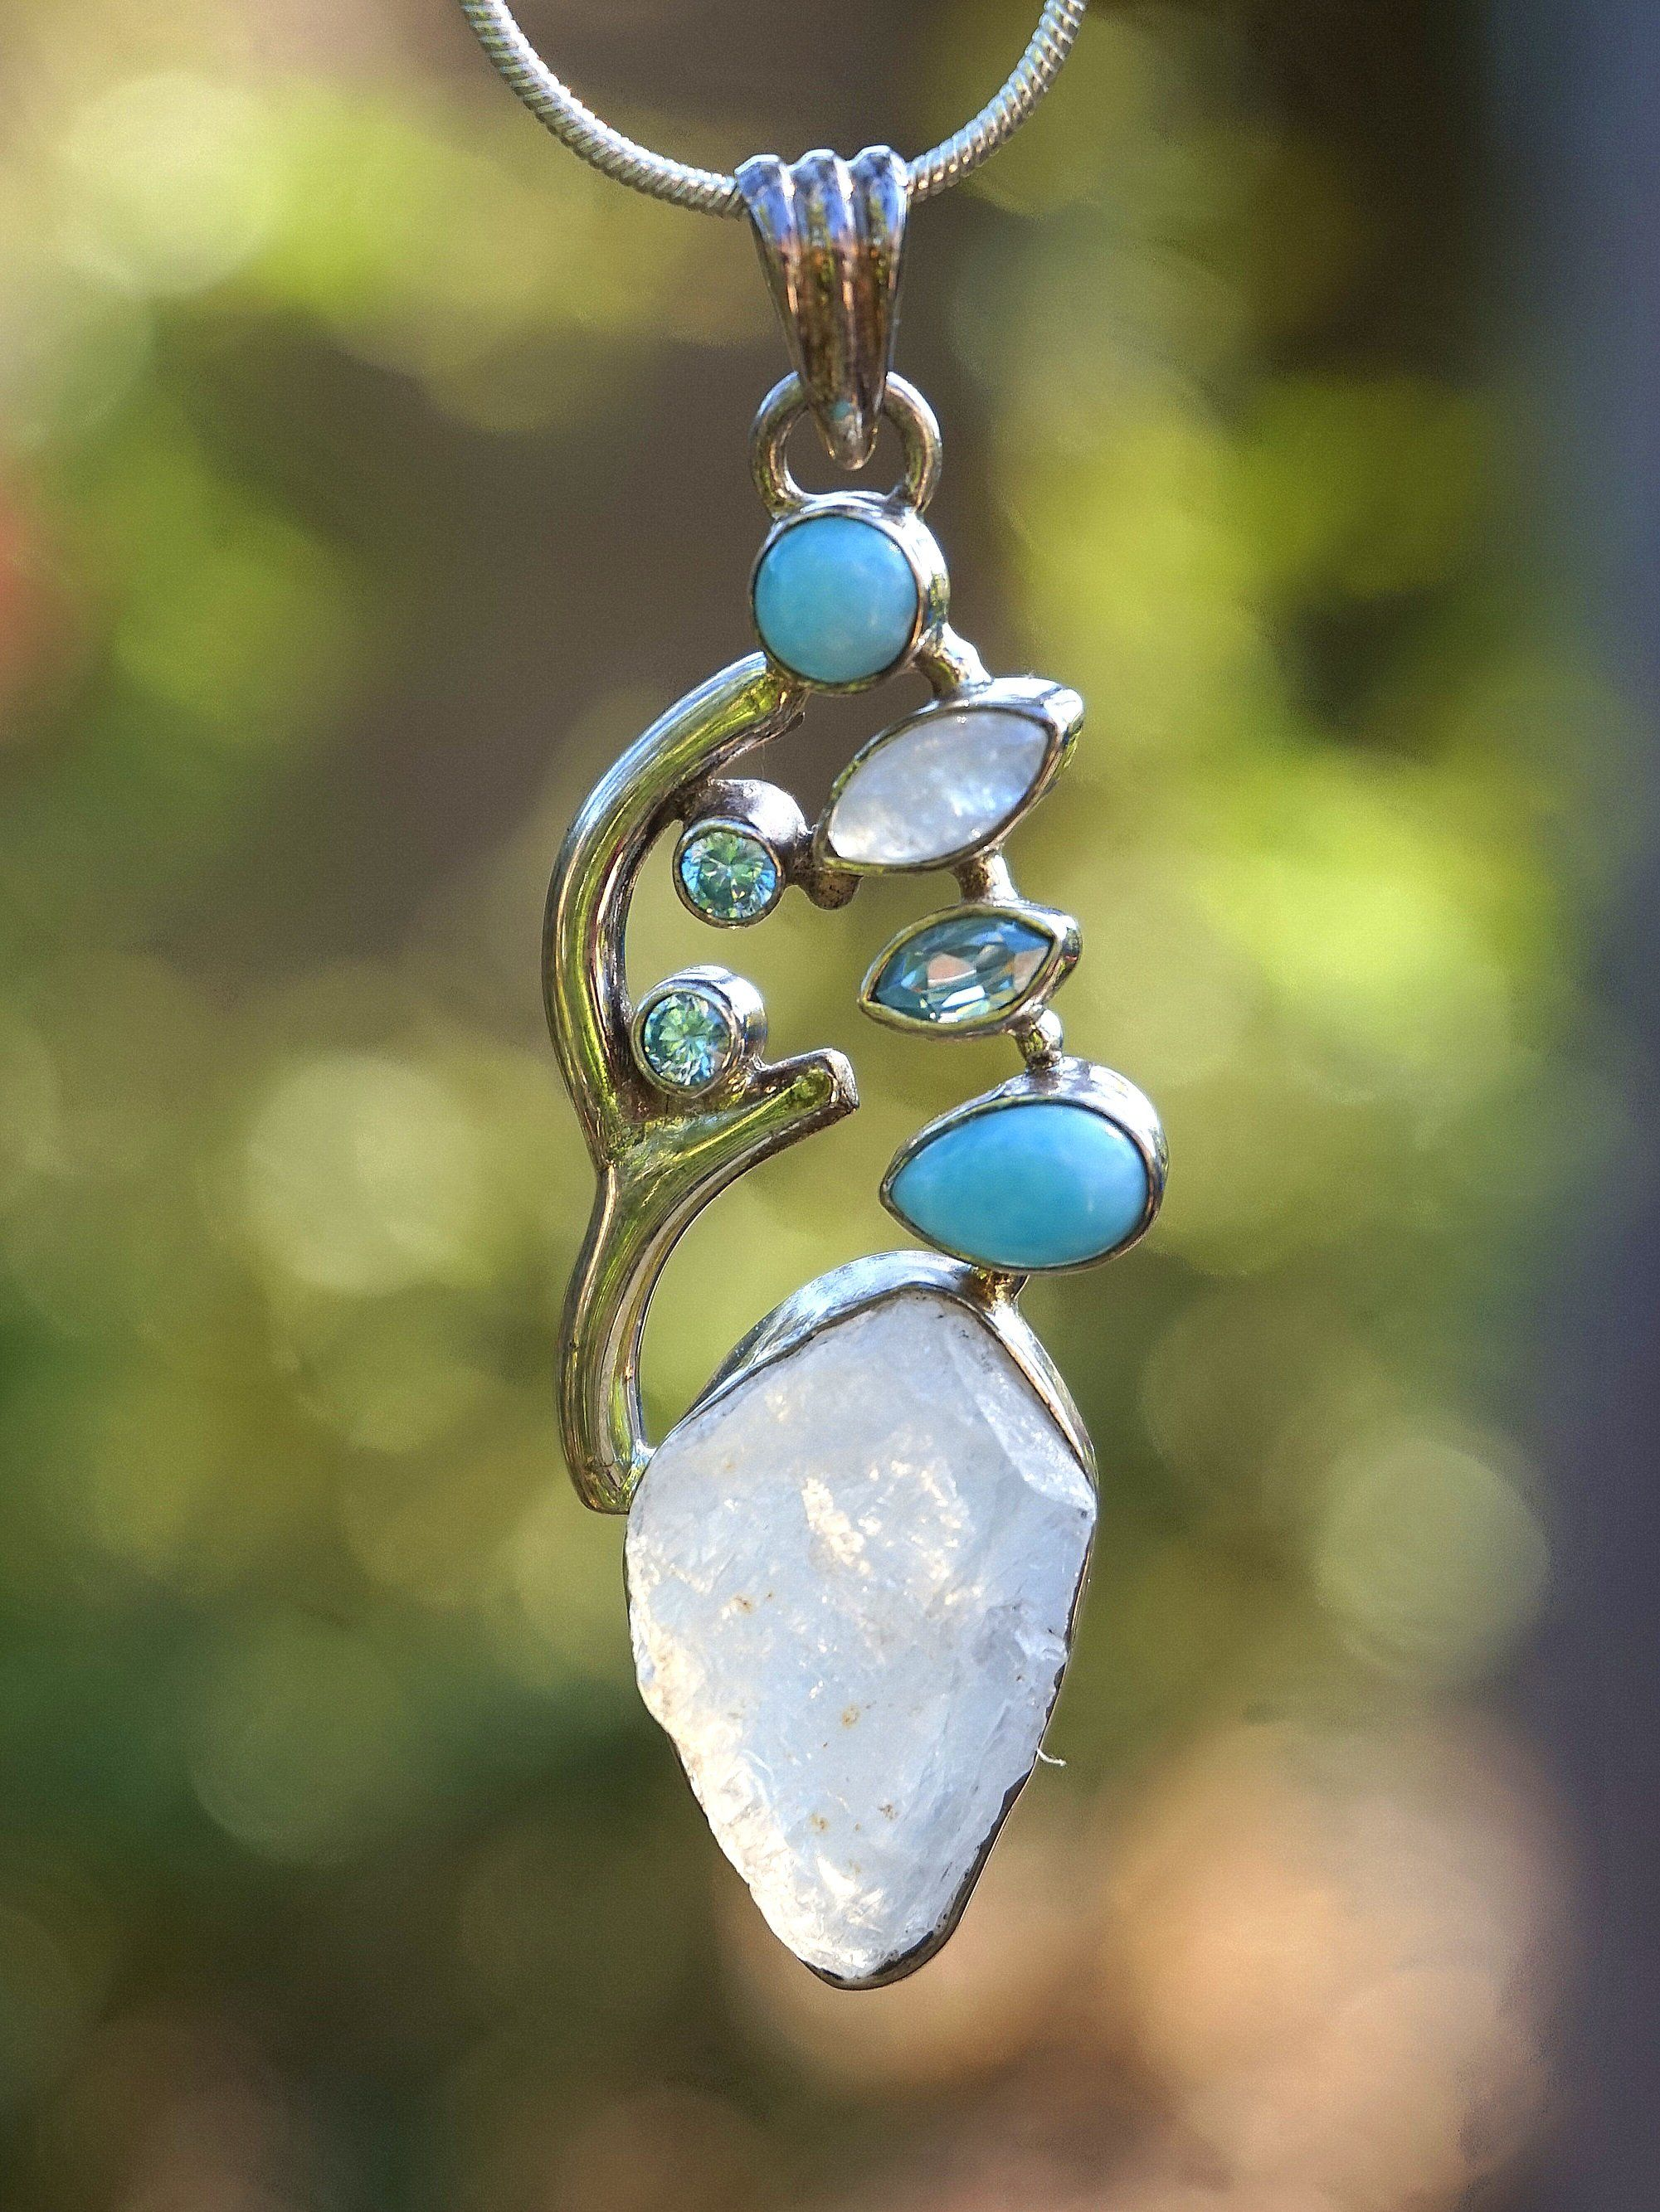 Gemstone Necklace Pendant Necklace Moonstone Drop Necklace Artisan Necklace Leaf Pendant Necklace Silver Leaf Necklace Long Necklace